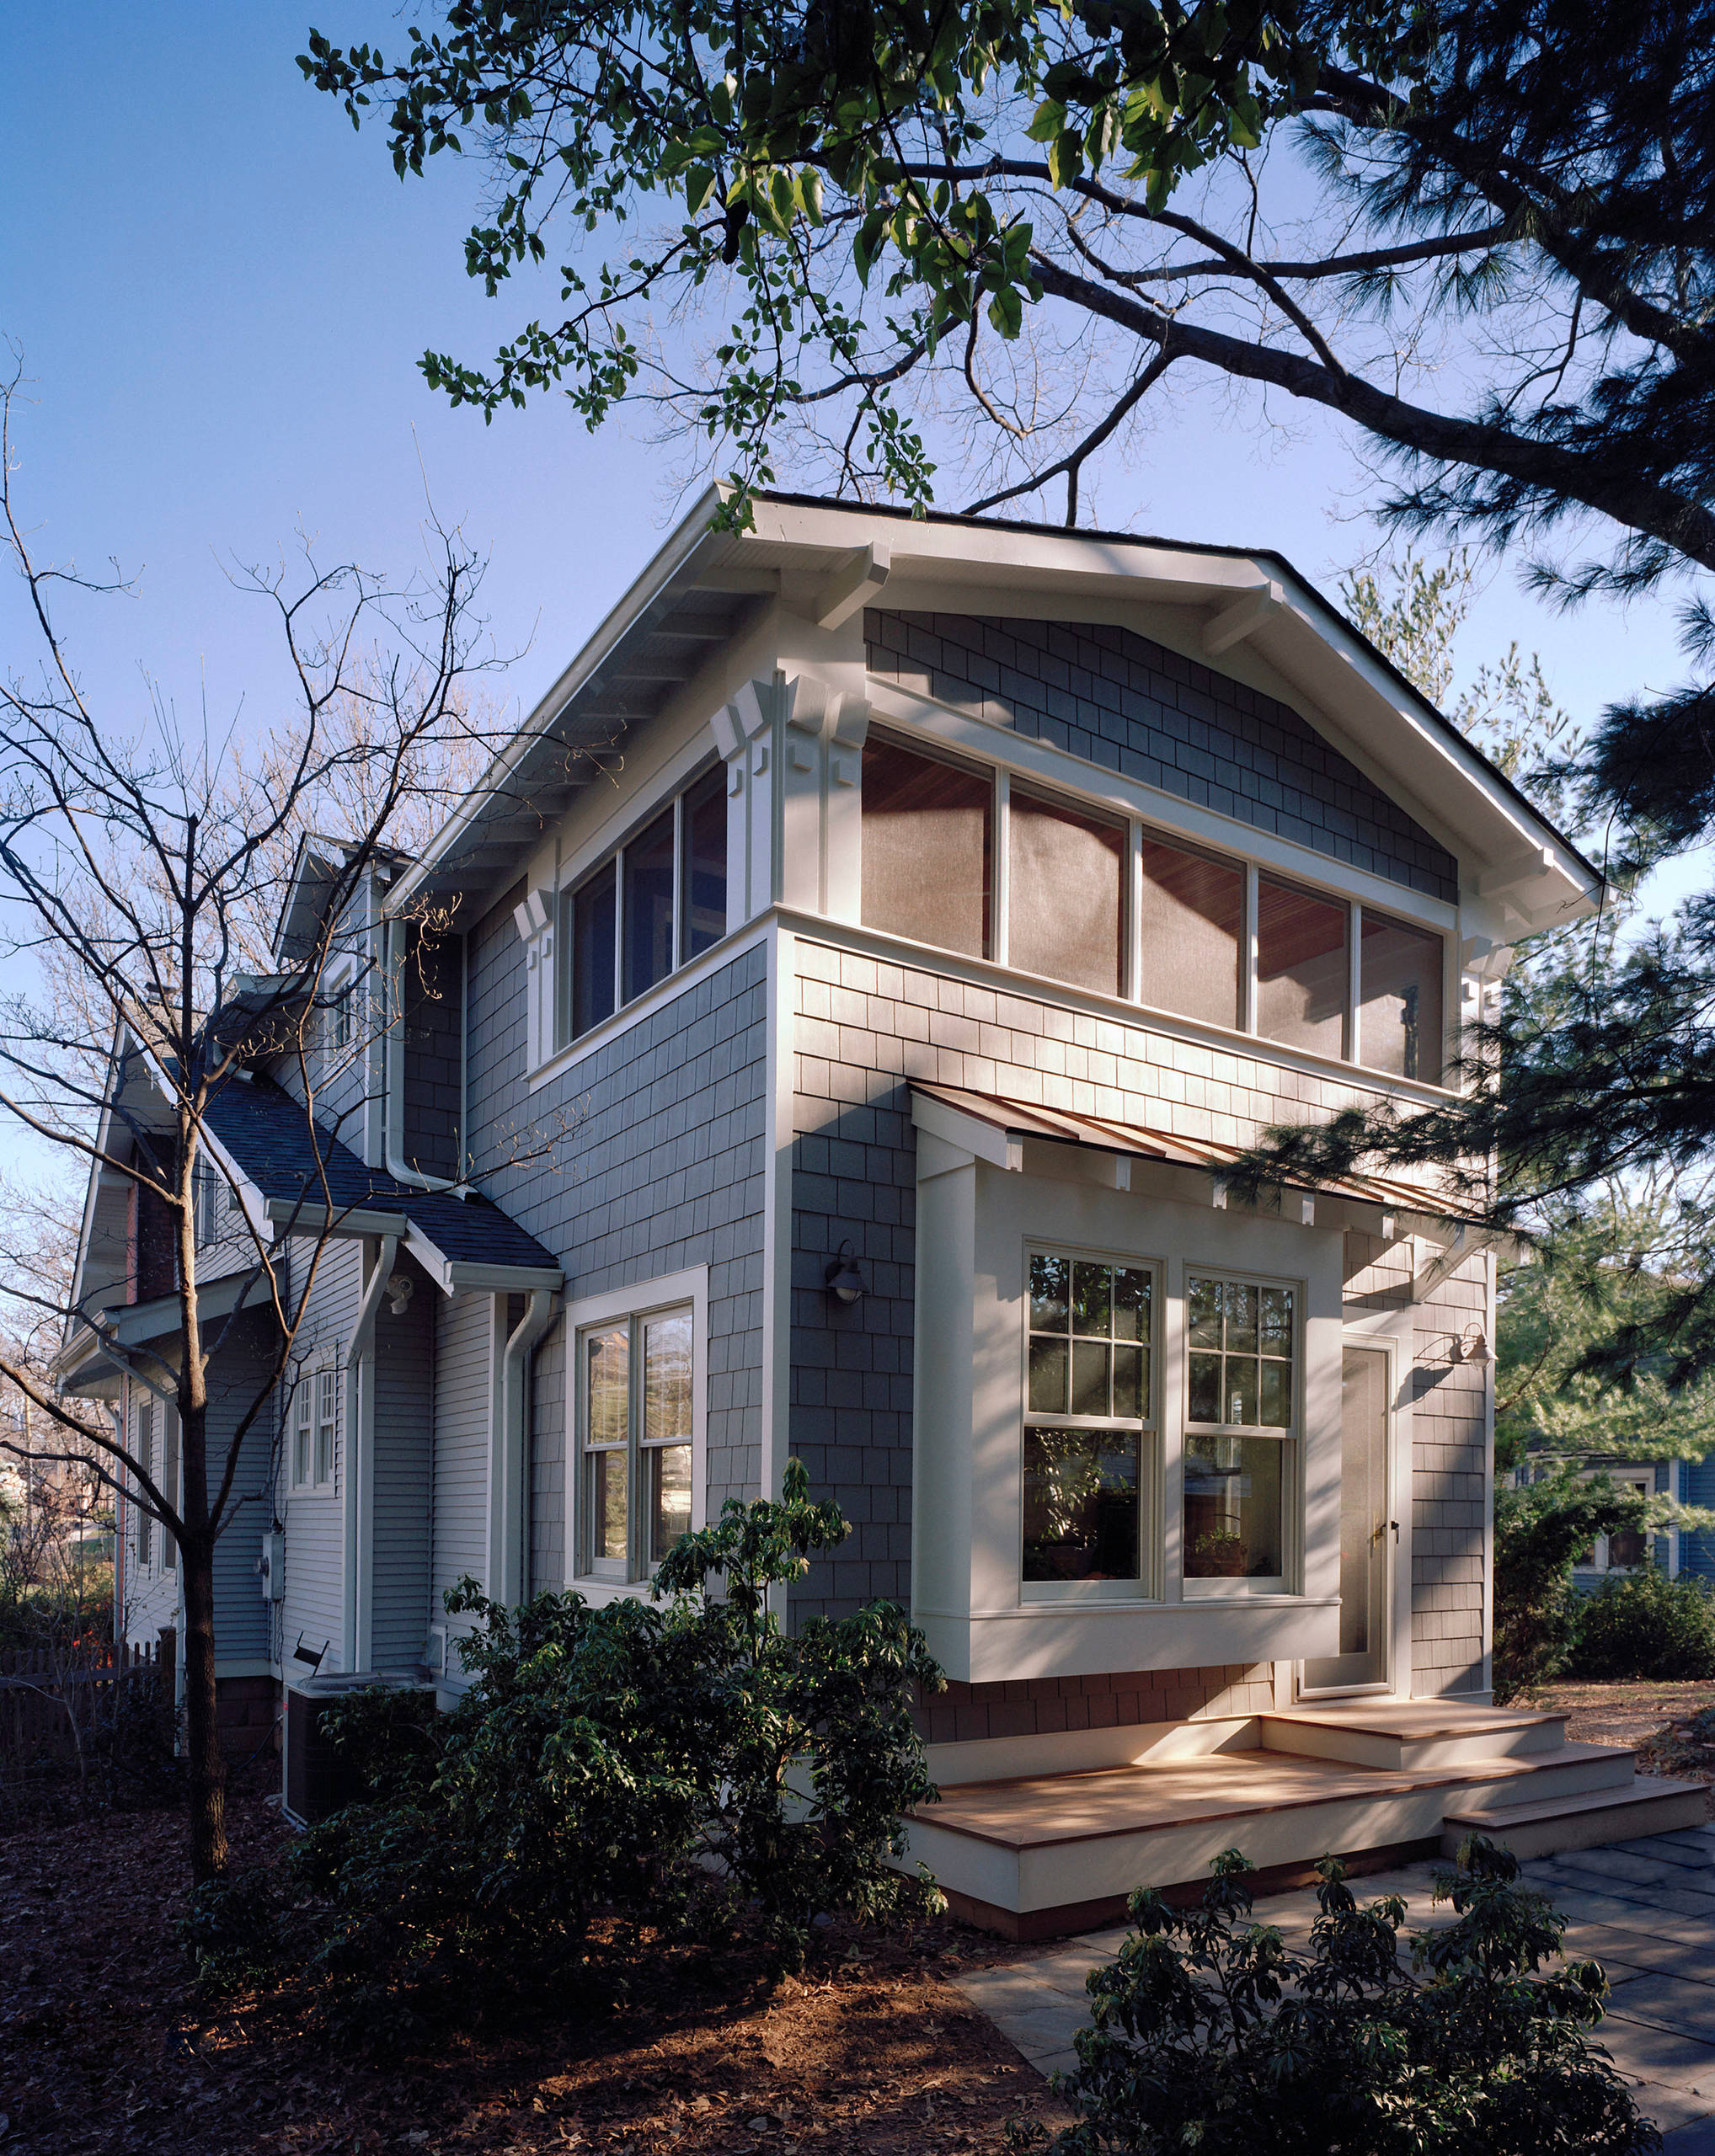 Arlington Bungalow Renovation